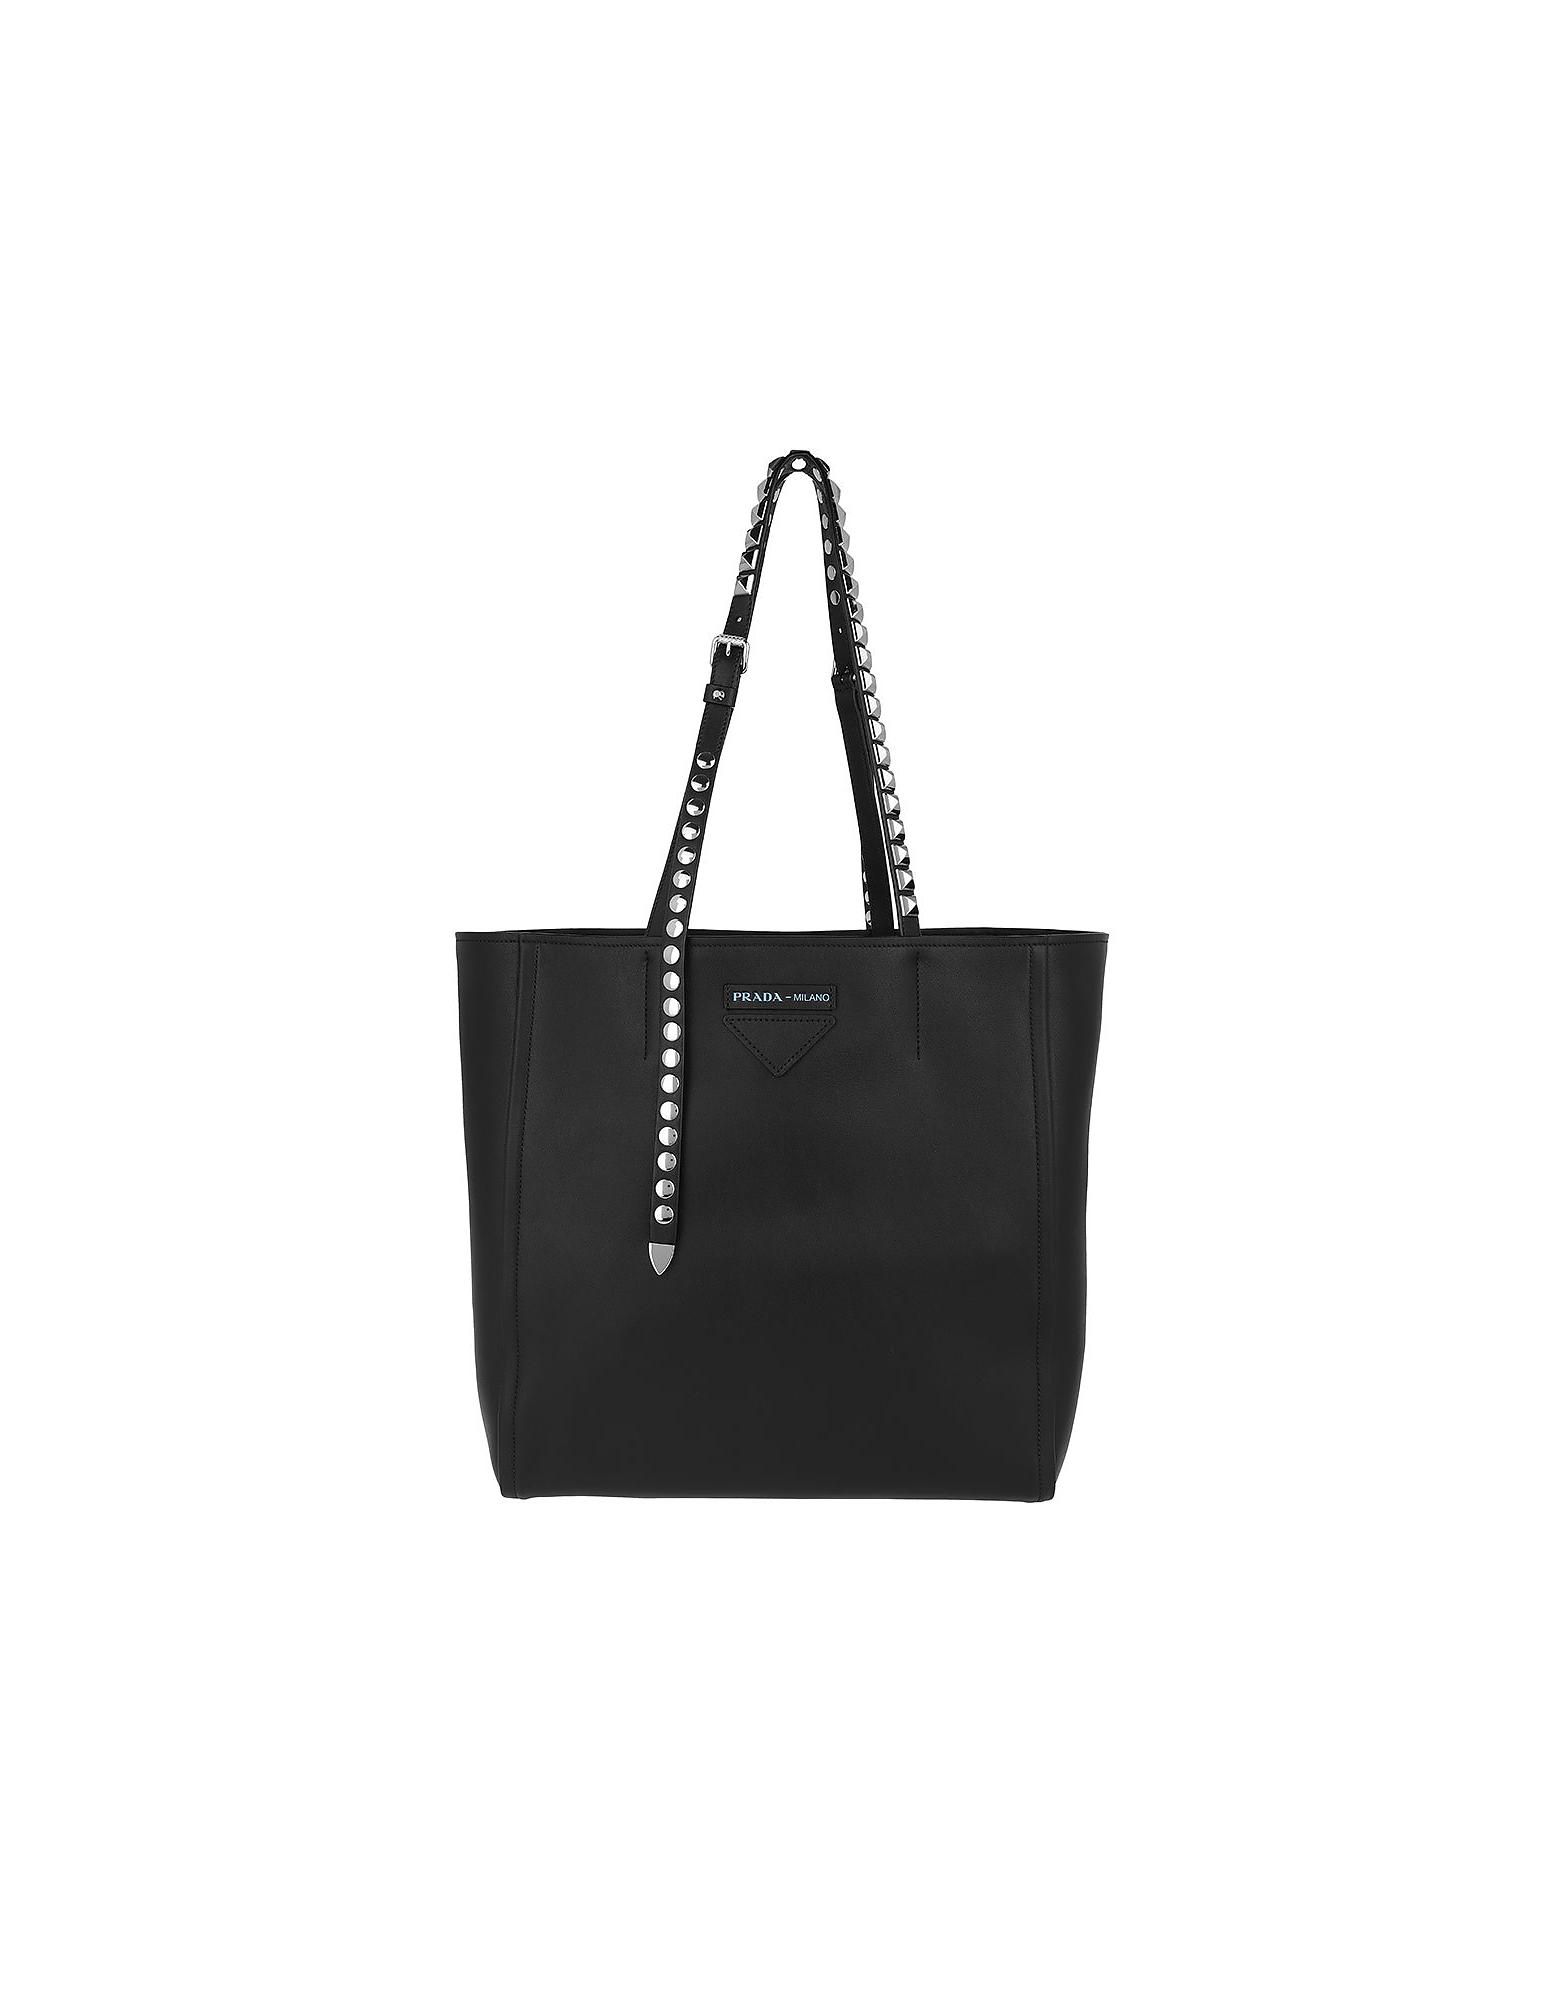 Prada Handbags, Grace Leather Tote Studded Nero